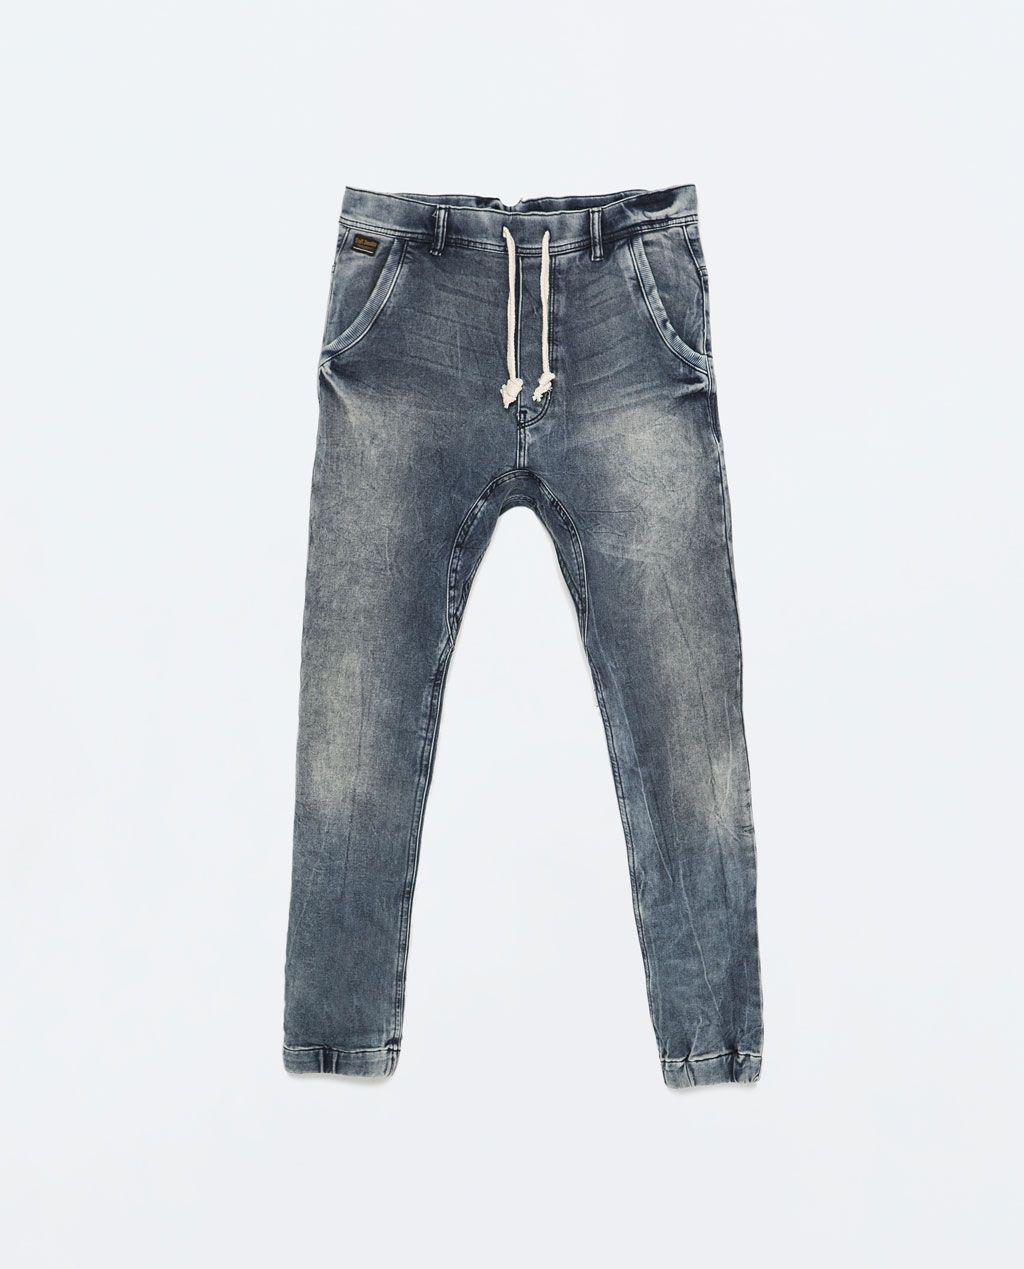 82fd8efd ZARA - MAN - VELOUR JEANS | jogger jeans | Jeans, Denim jeans, Zara man